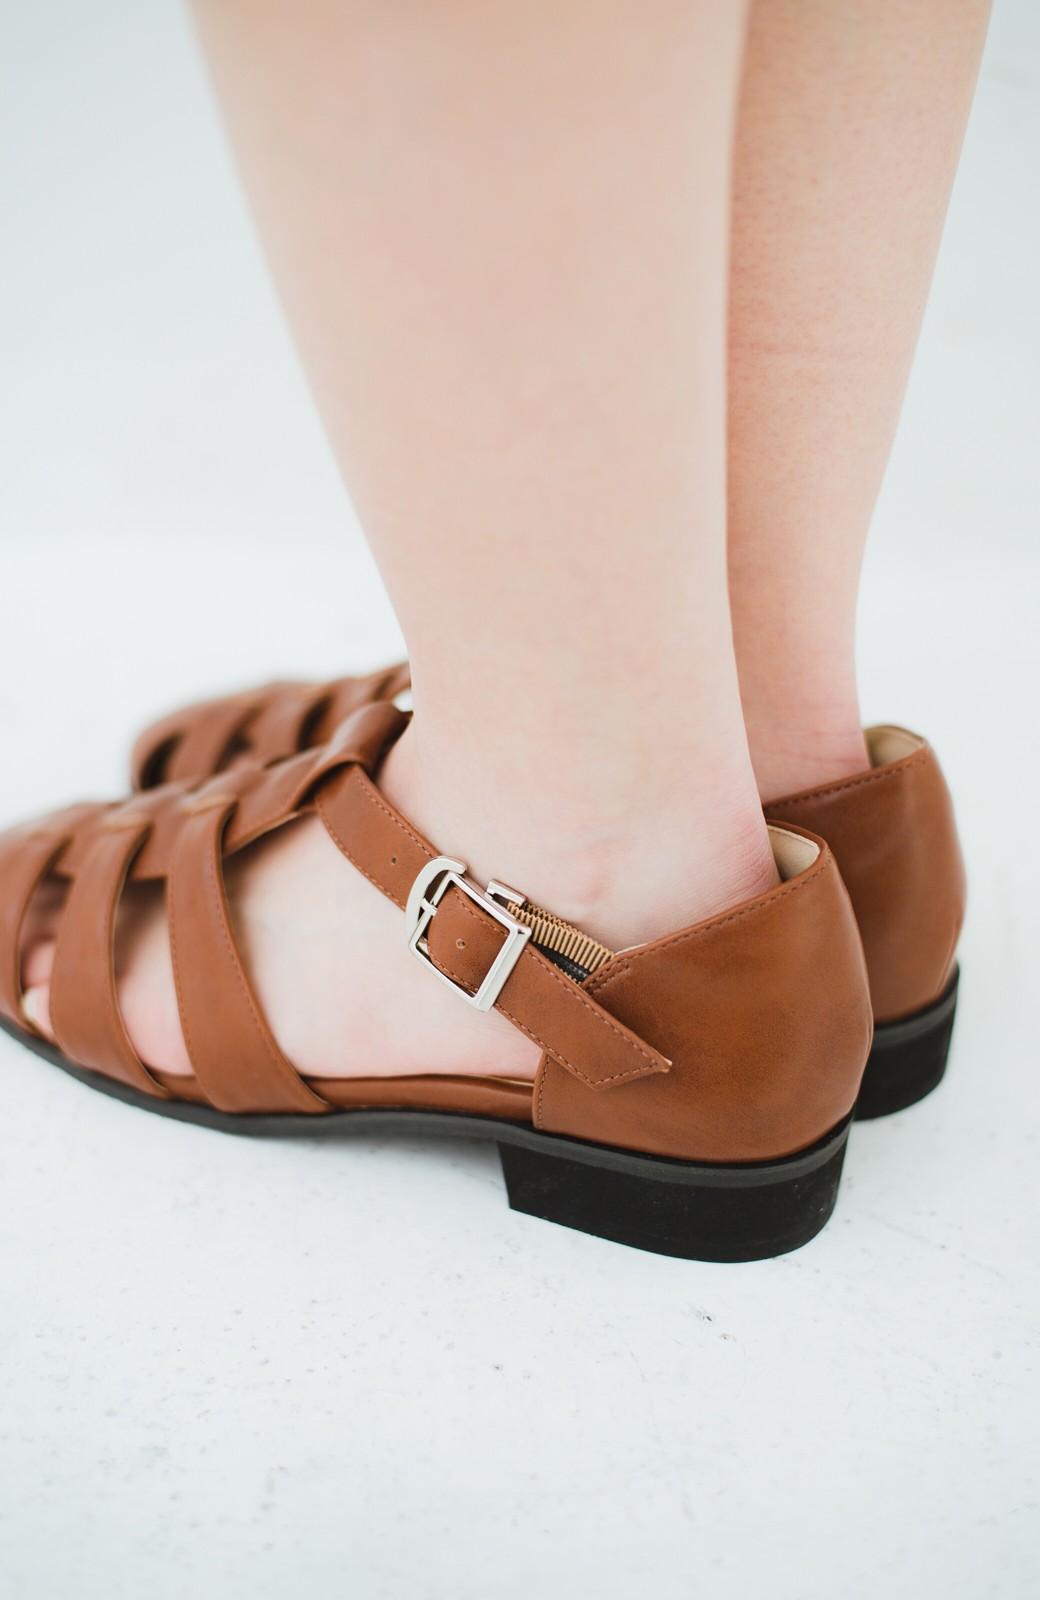 haco! 靴下でも素足でも合う 本革風編み込みサンダル <ブラウン>の商品写真5